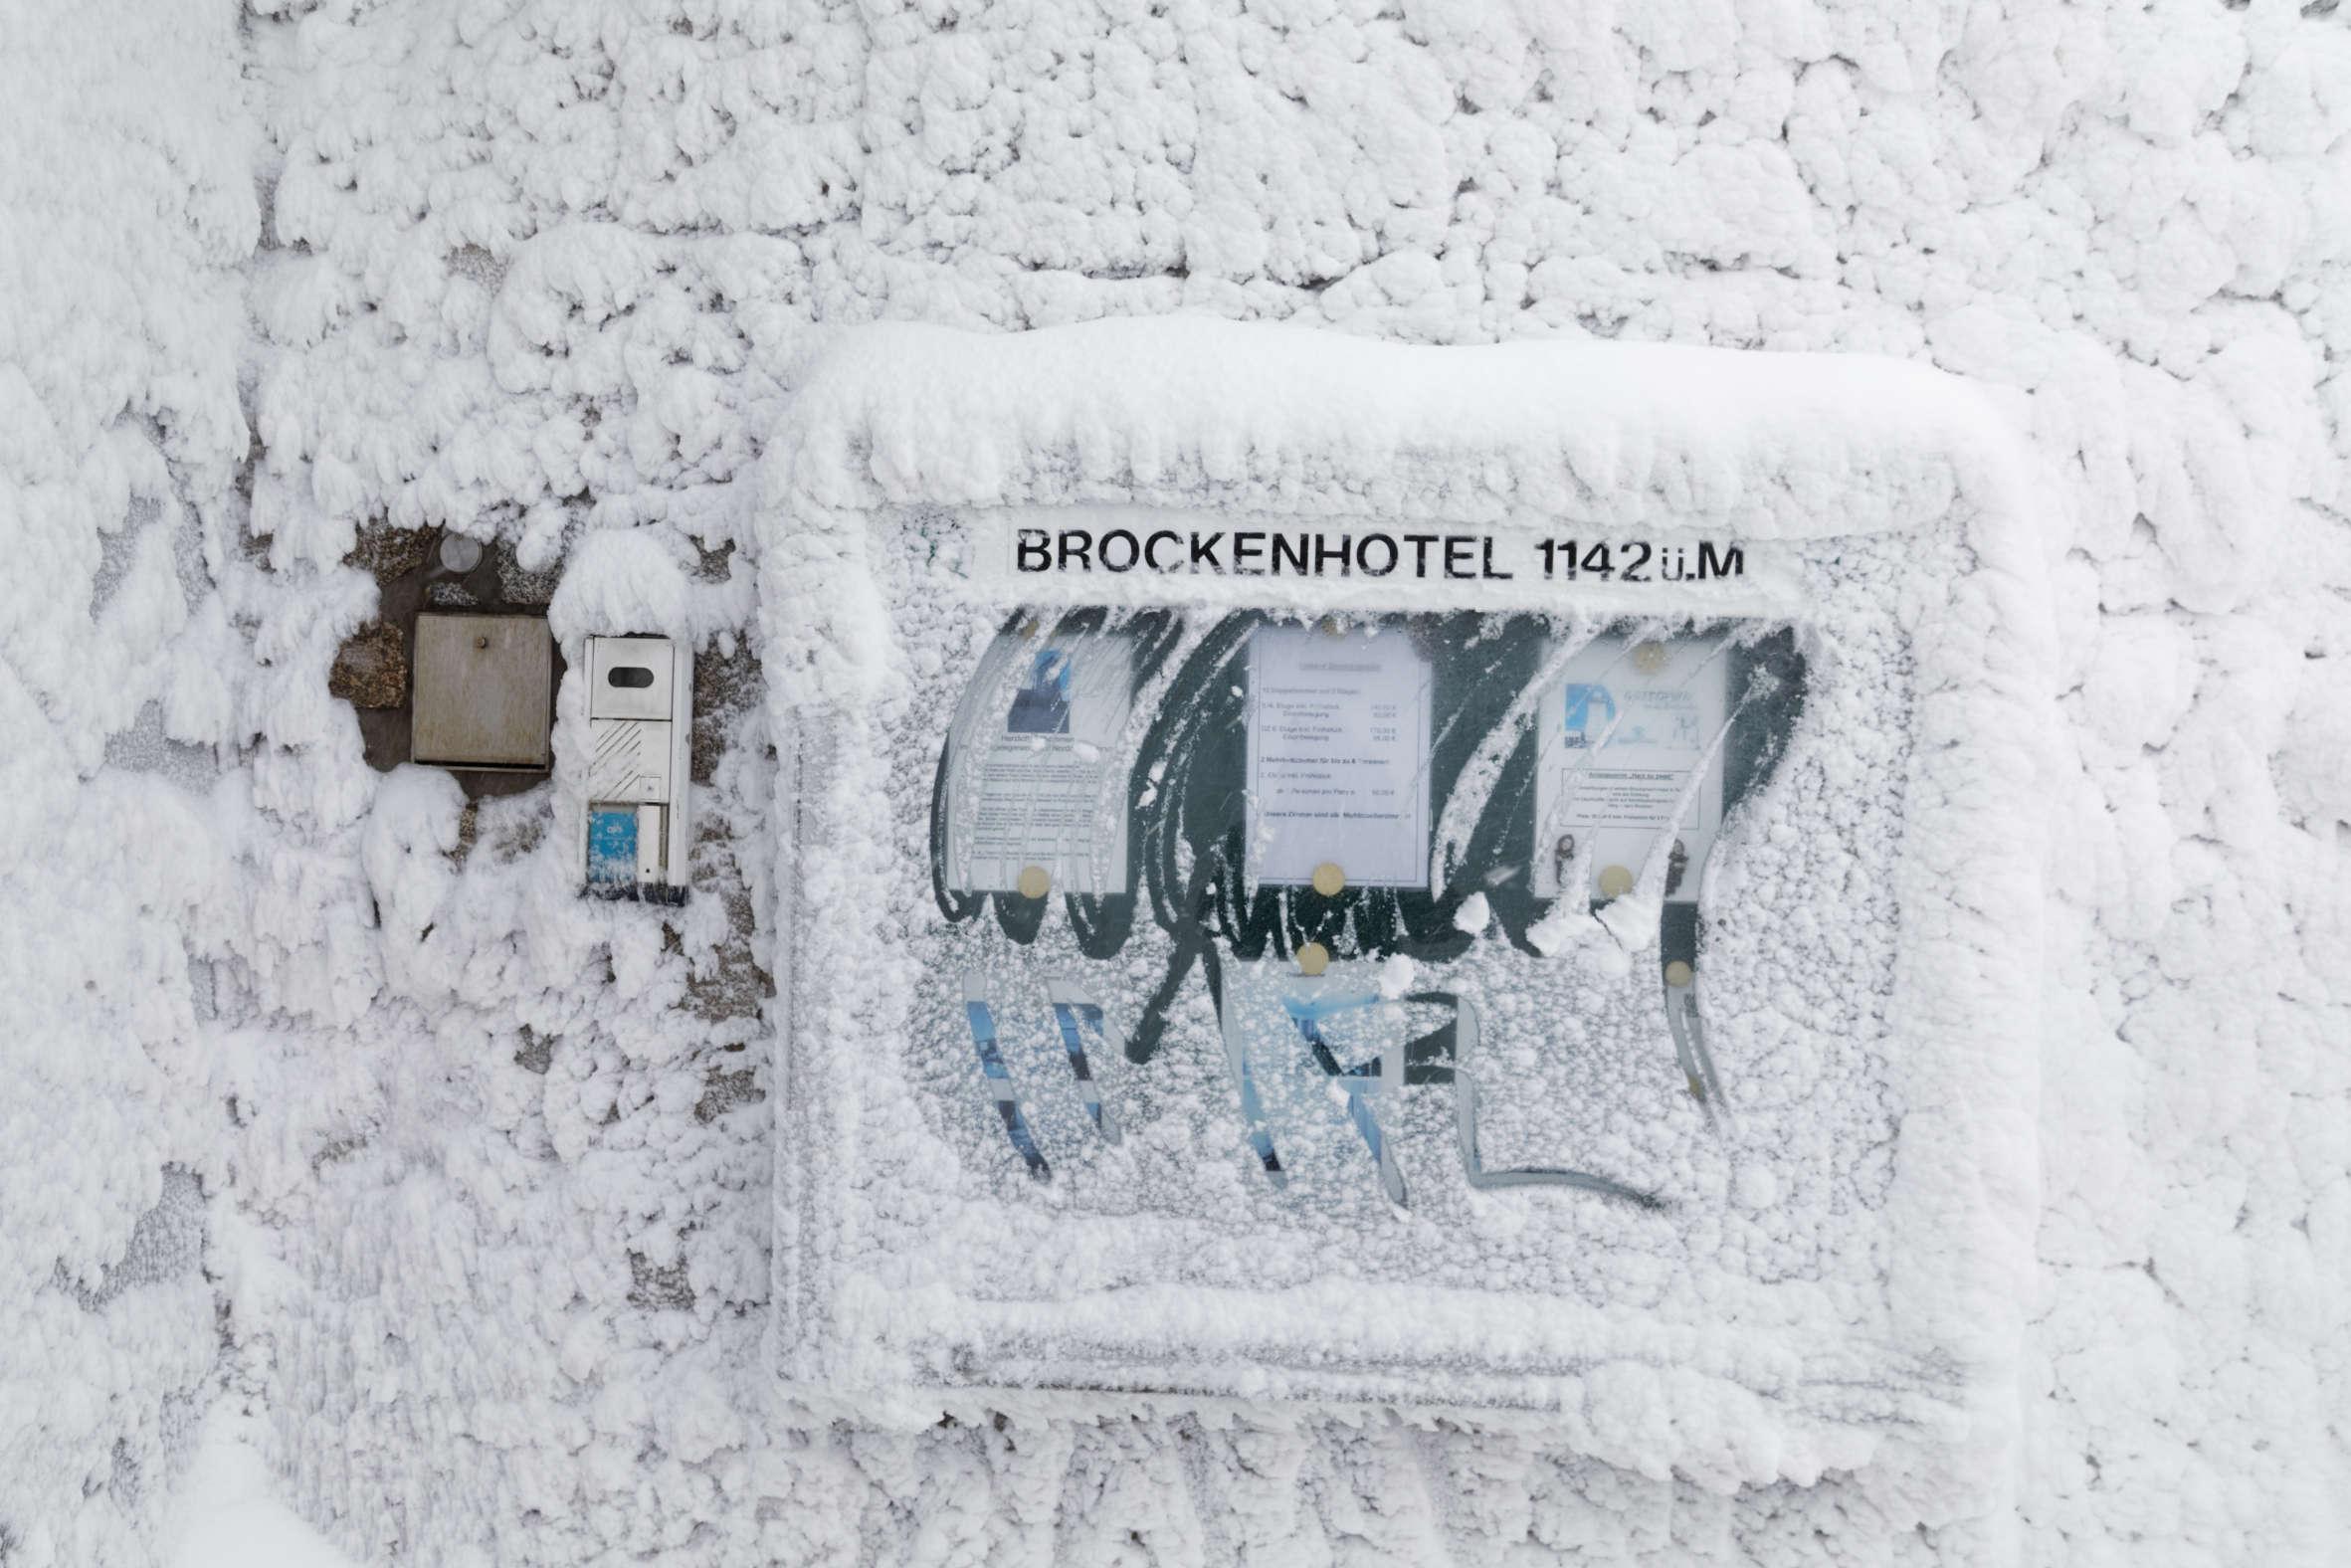 Brockenhotel